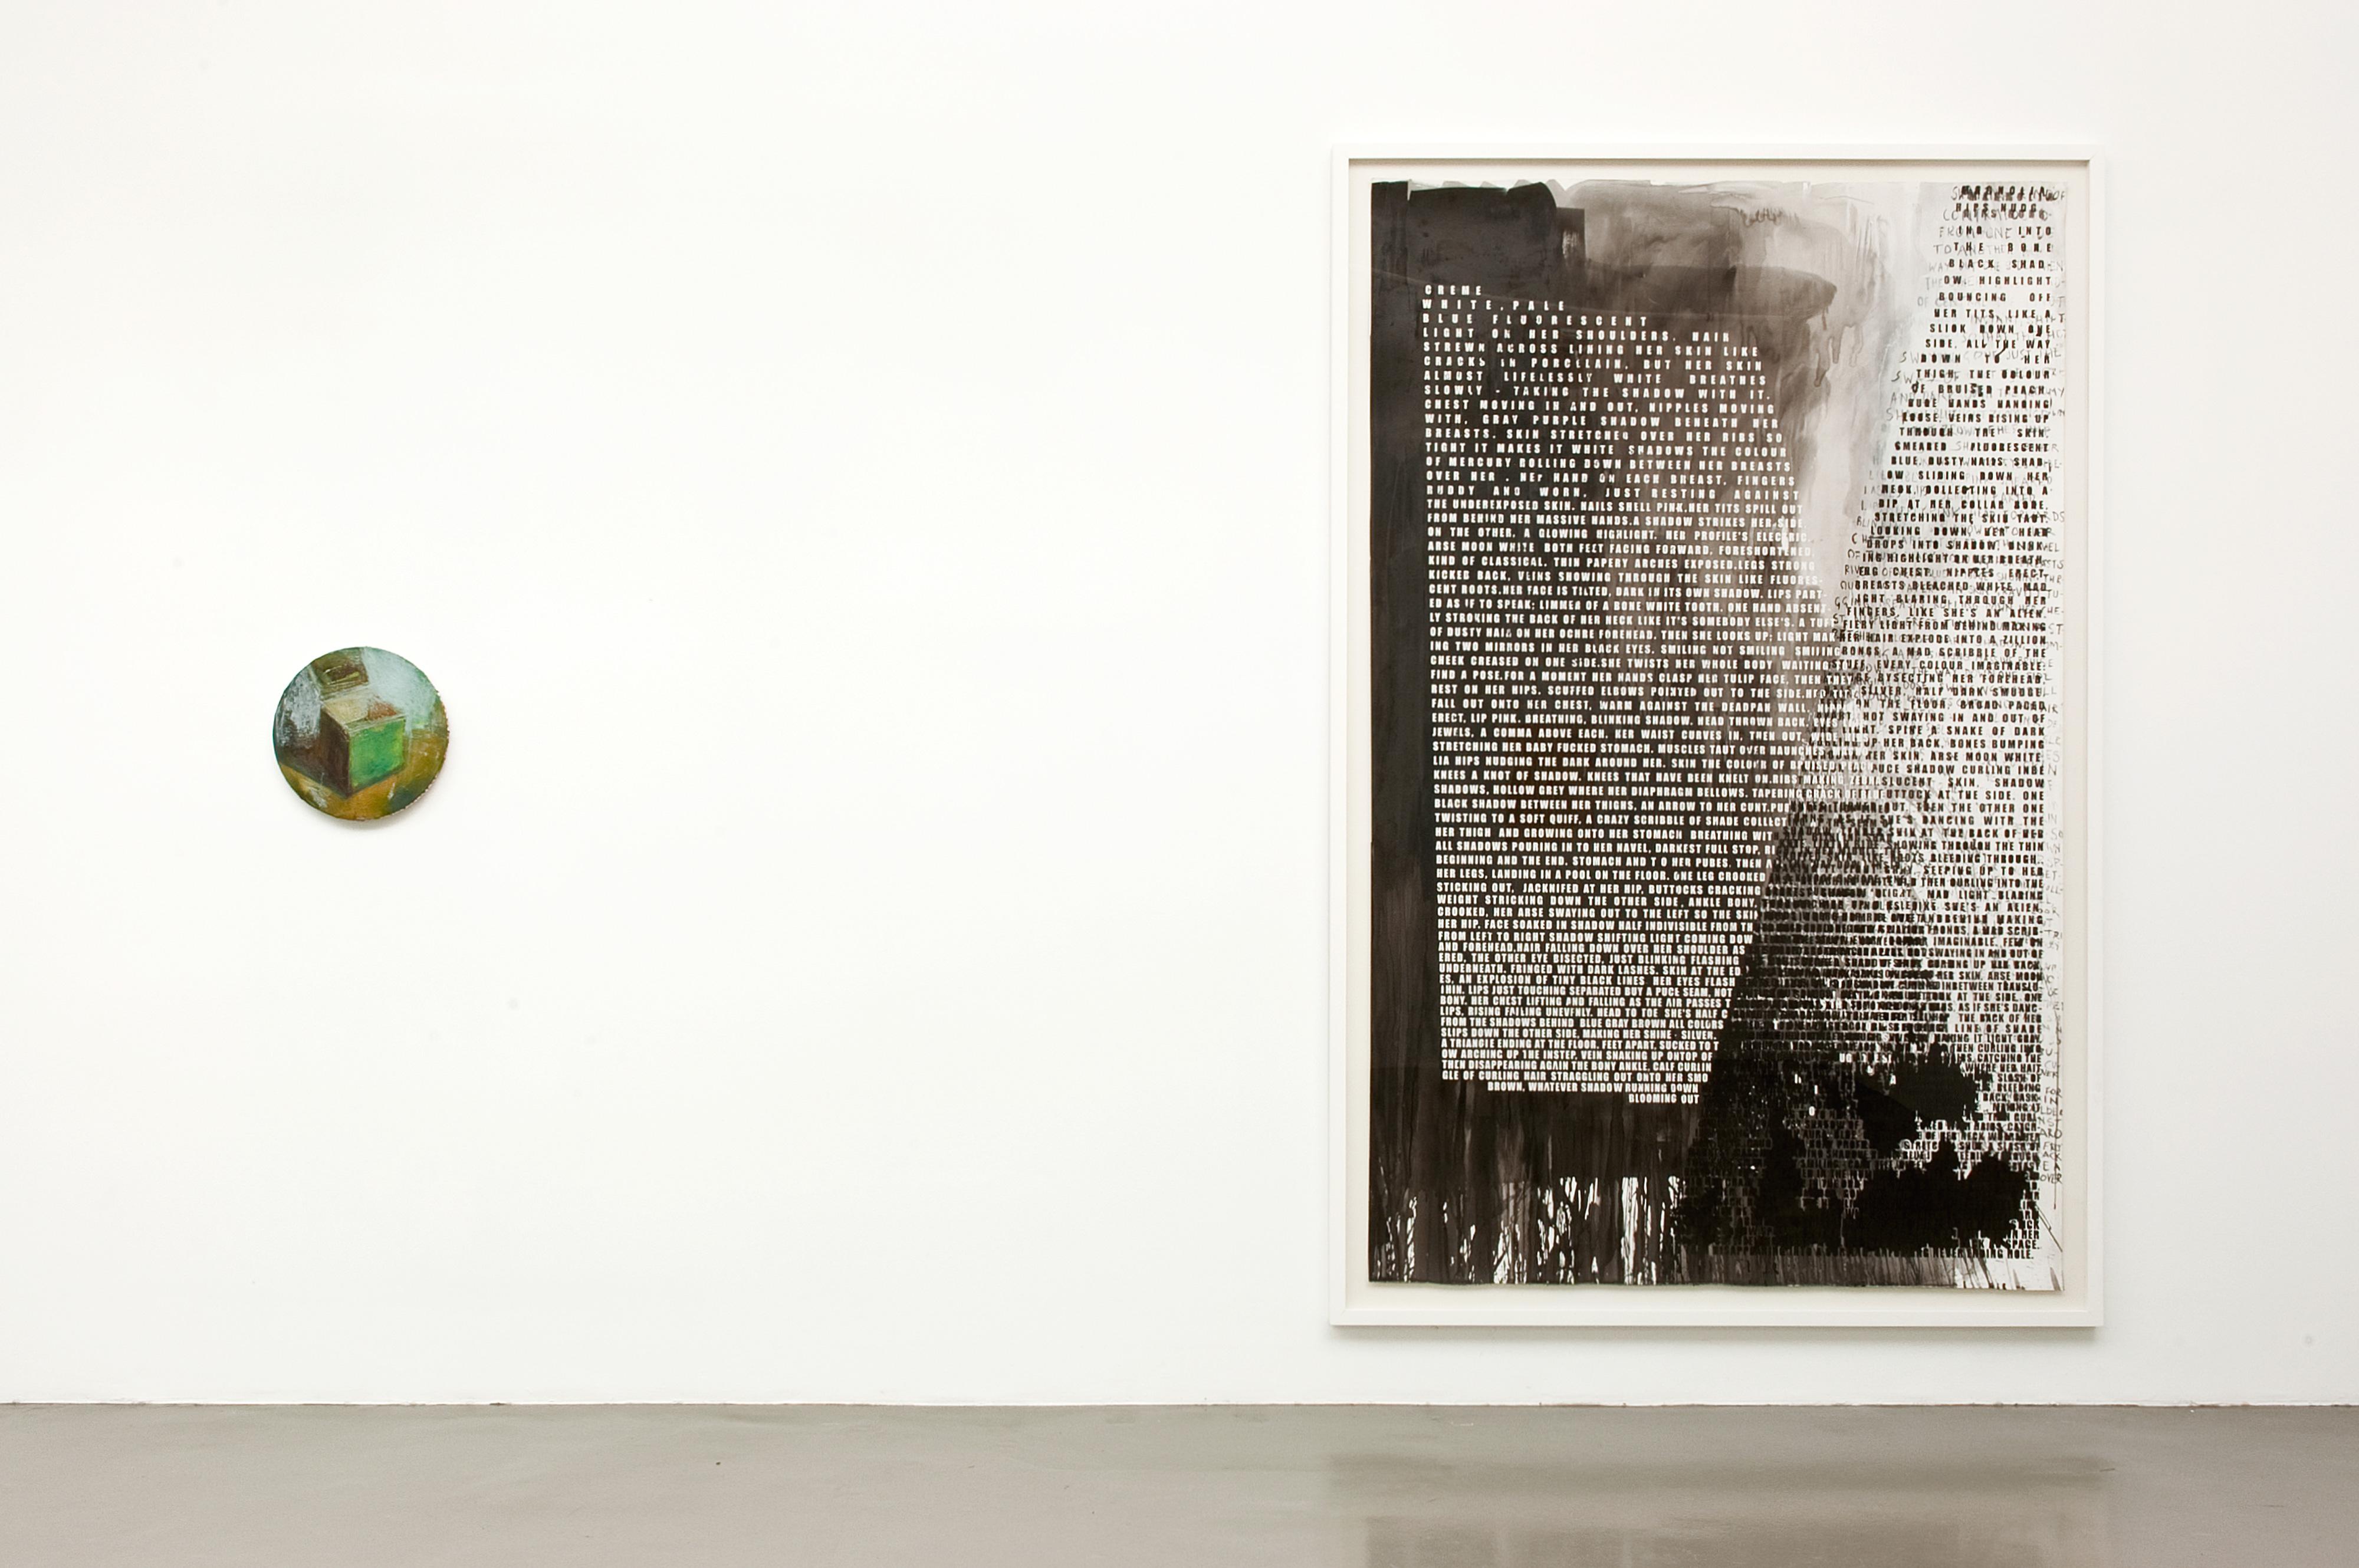 Galerie Barbara Thumm \ Fiona Banner aka The Vanity Press – Summerstage